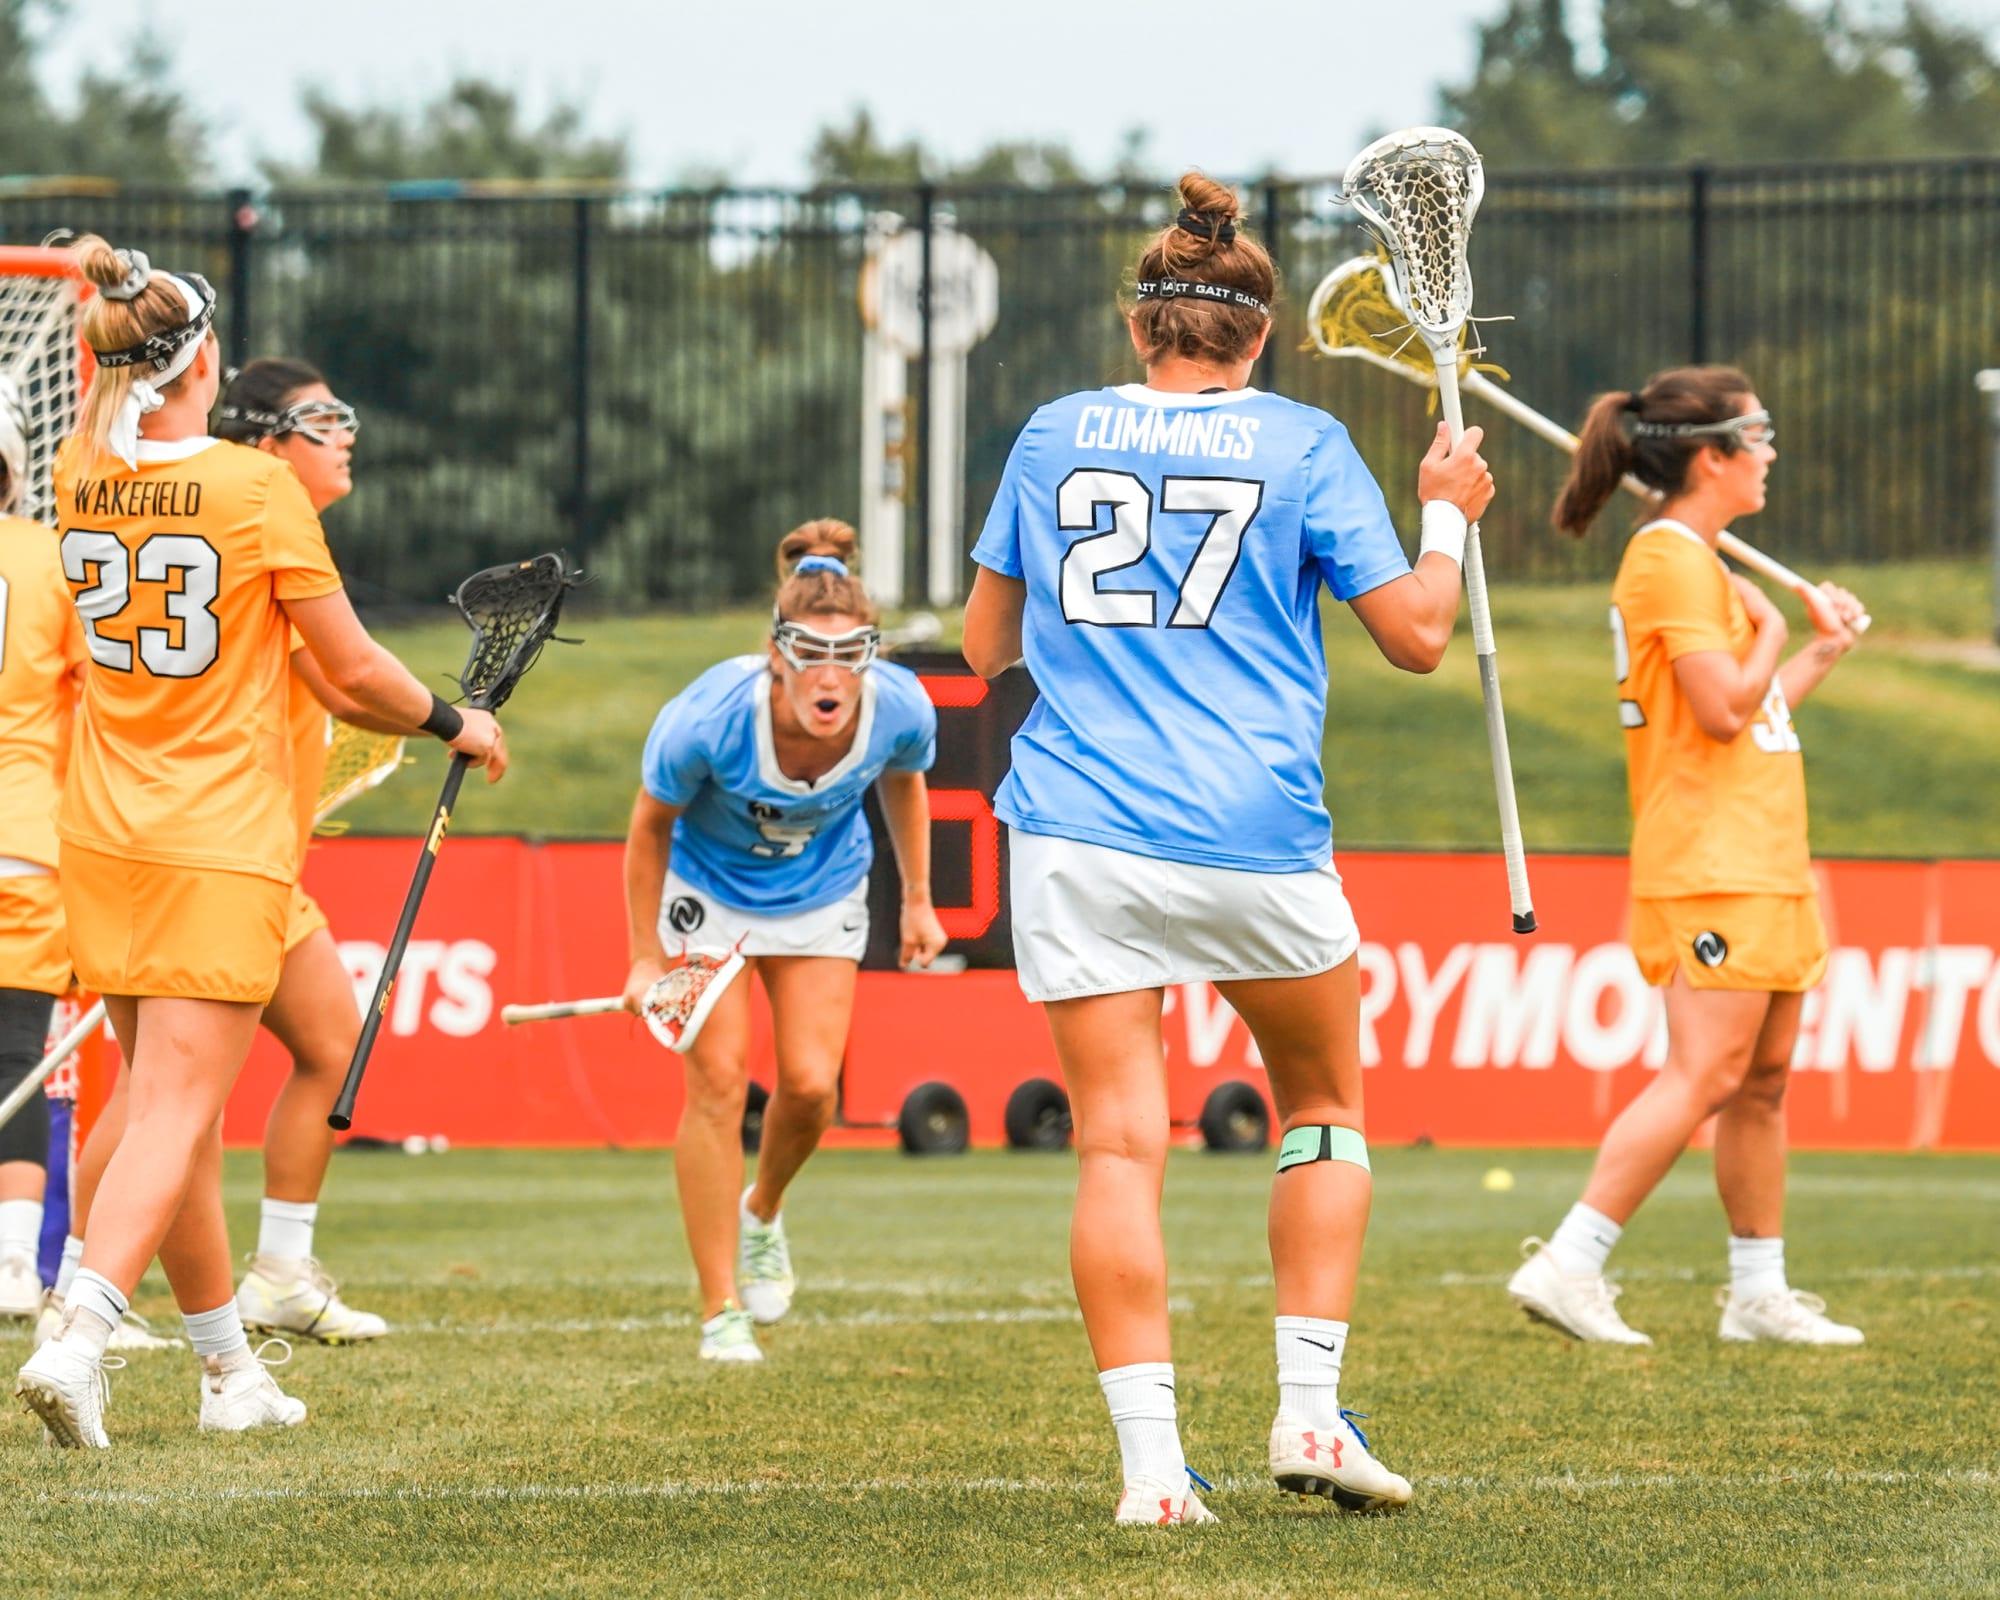 Taylor Cummings Athletes Unlimited Lacrosse